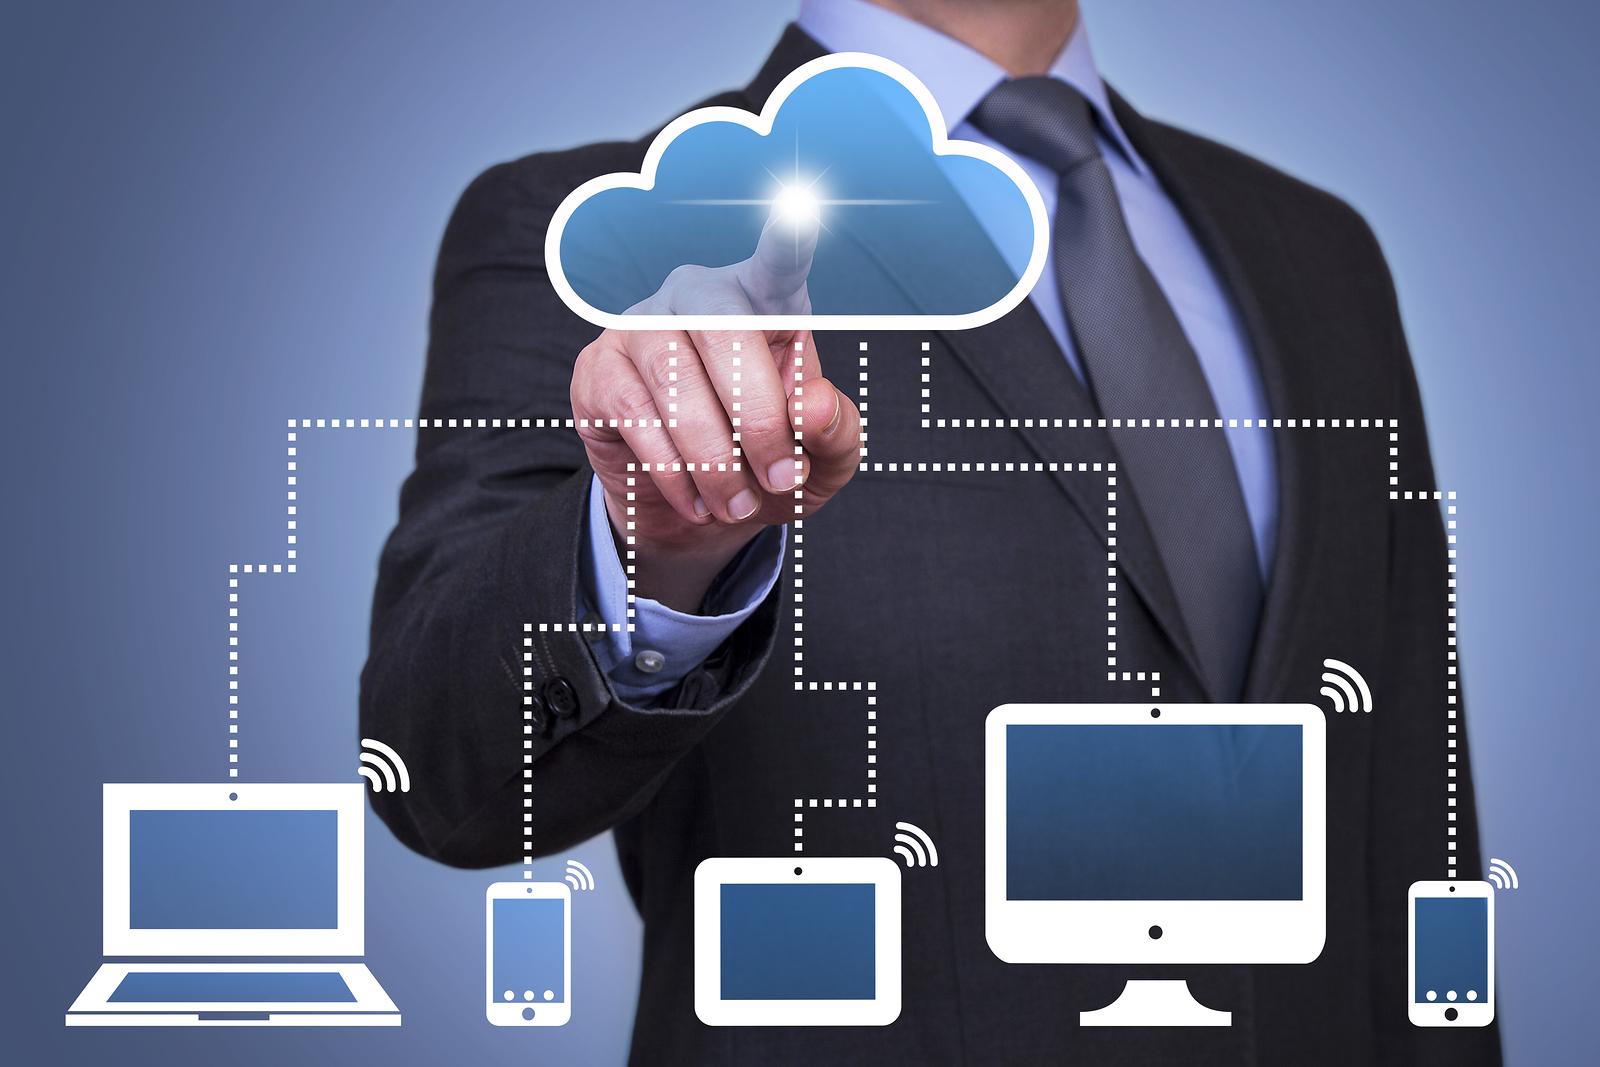 Cloud Computing Concepts technology cloud solution ideas